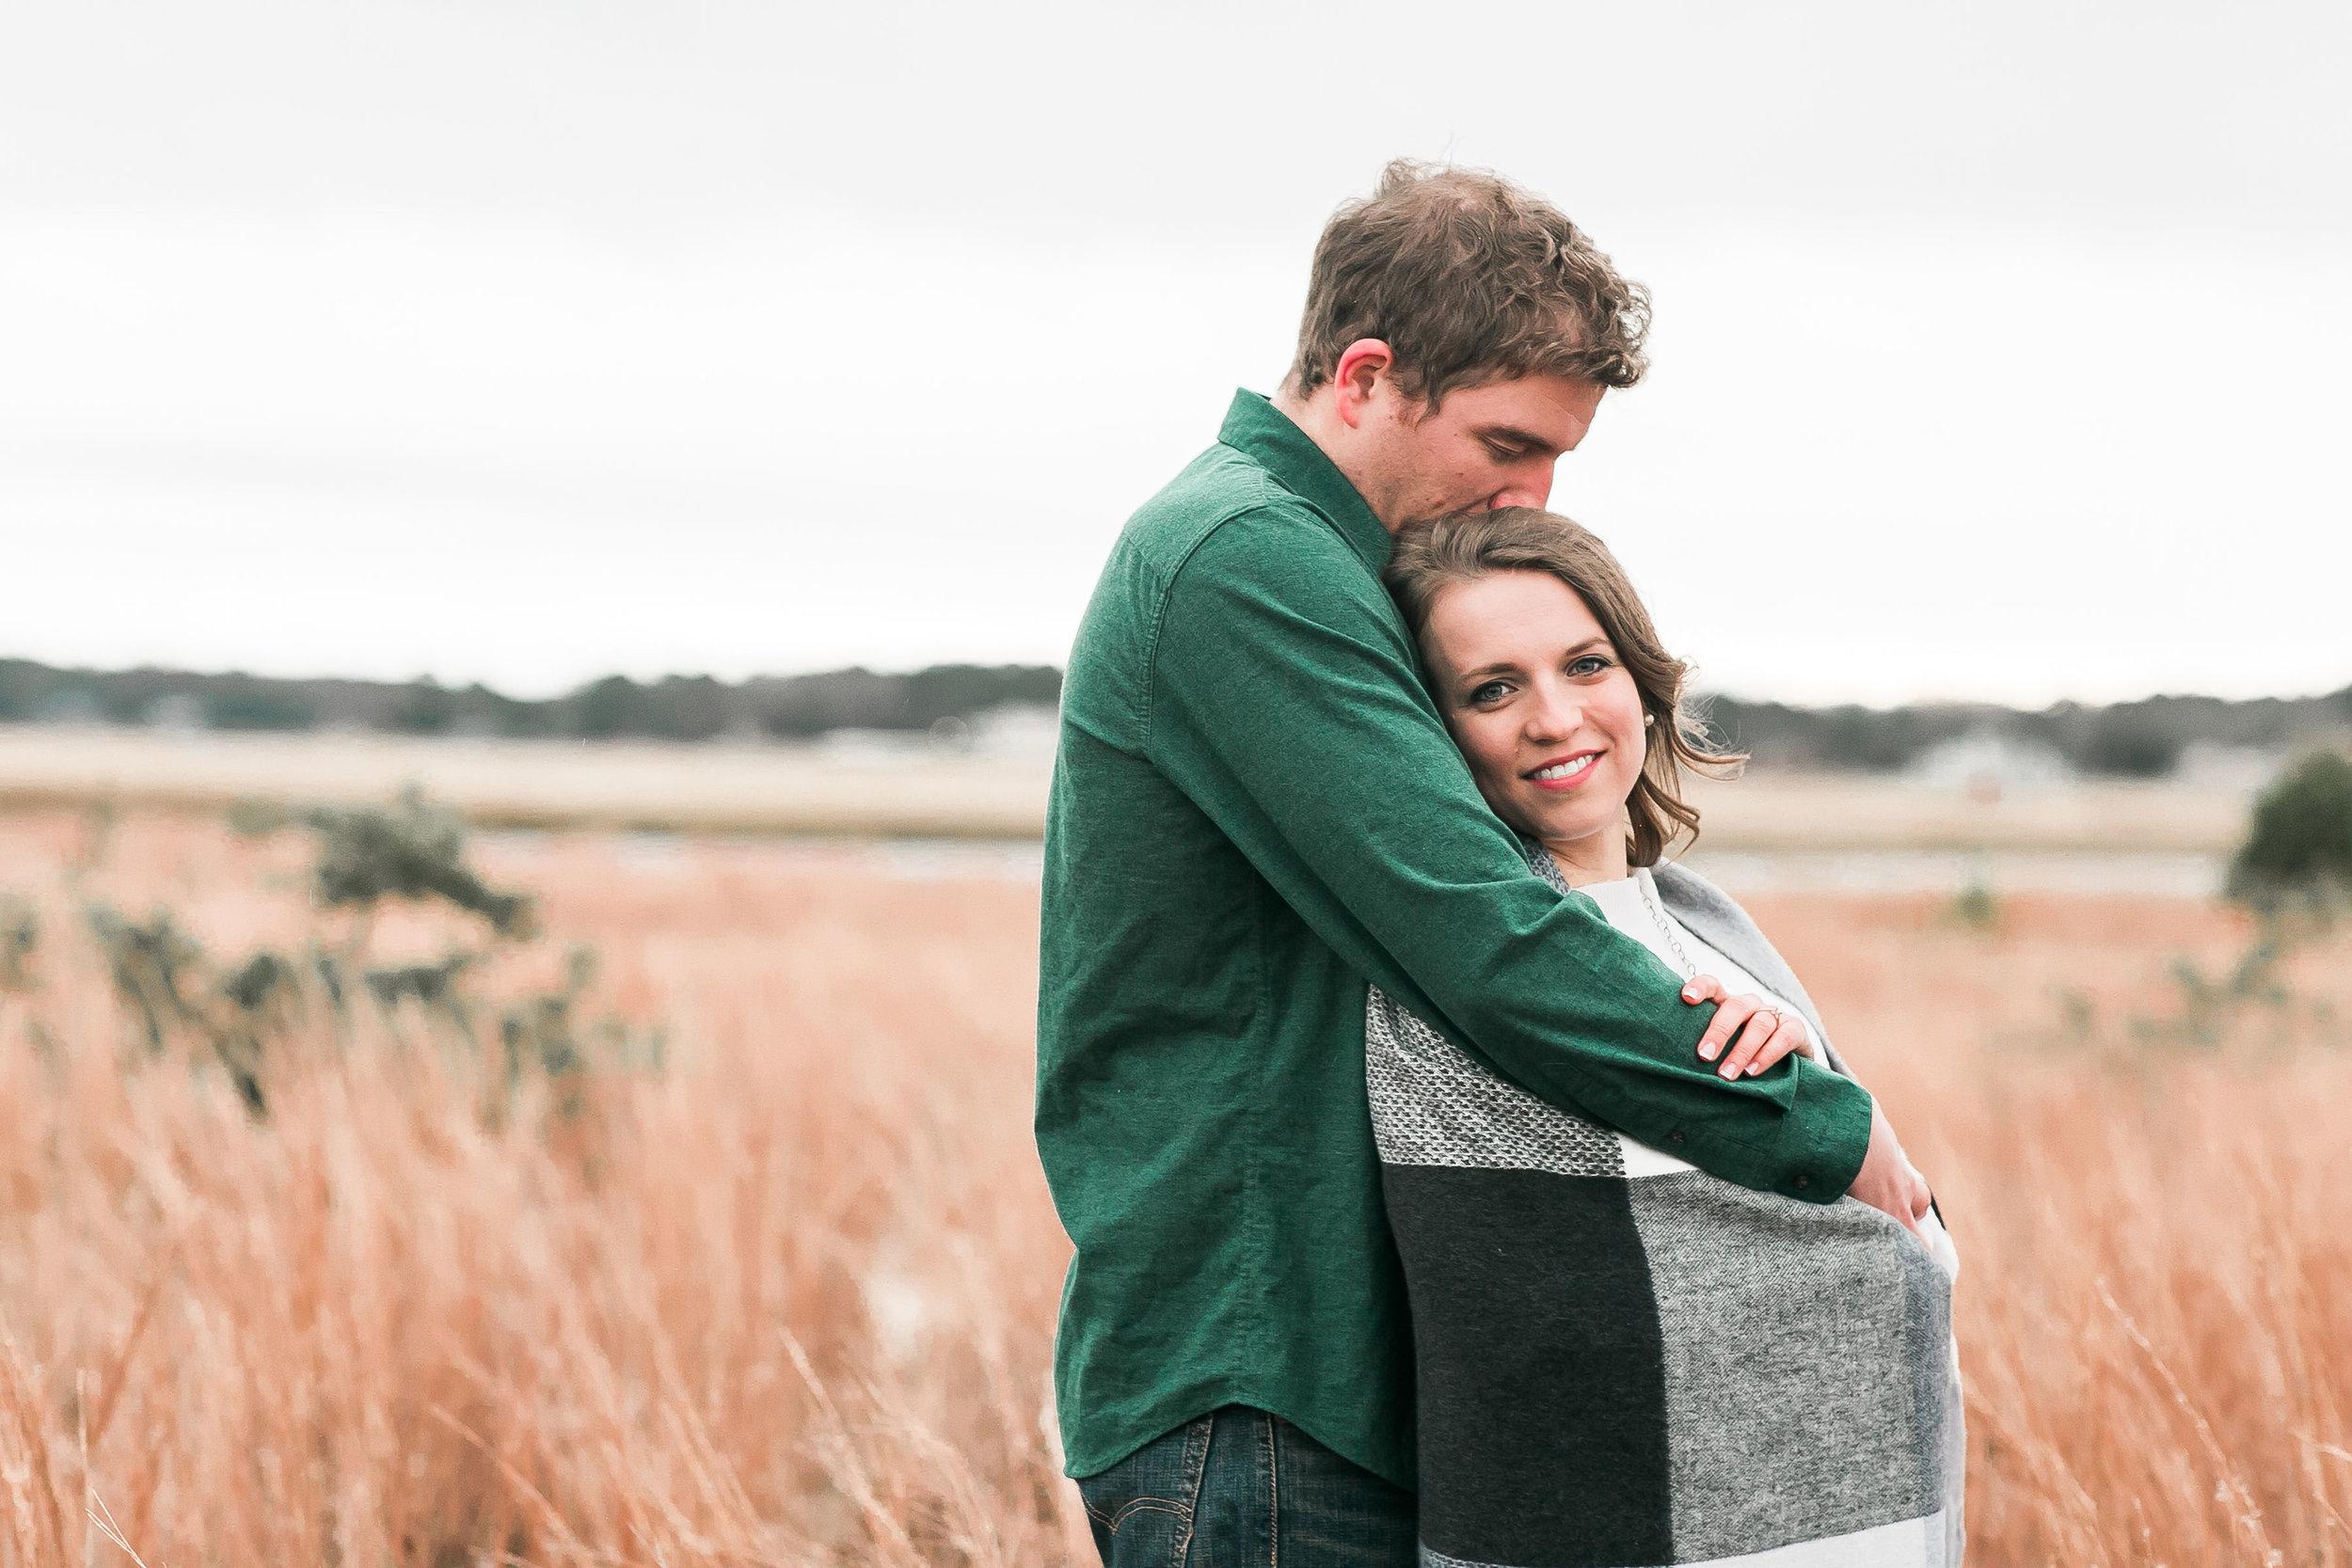 Avery&Tom_Engagements-121.jpg